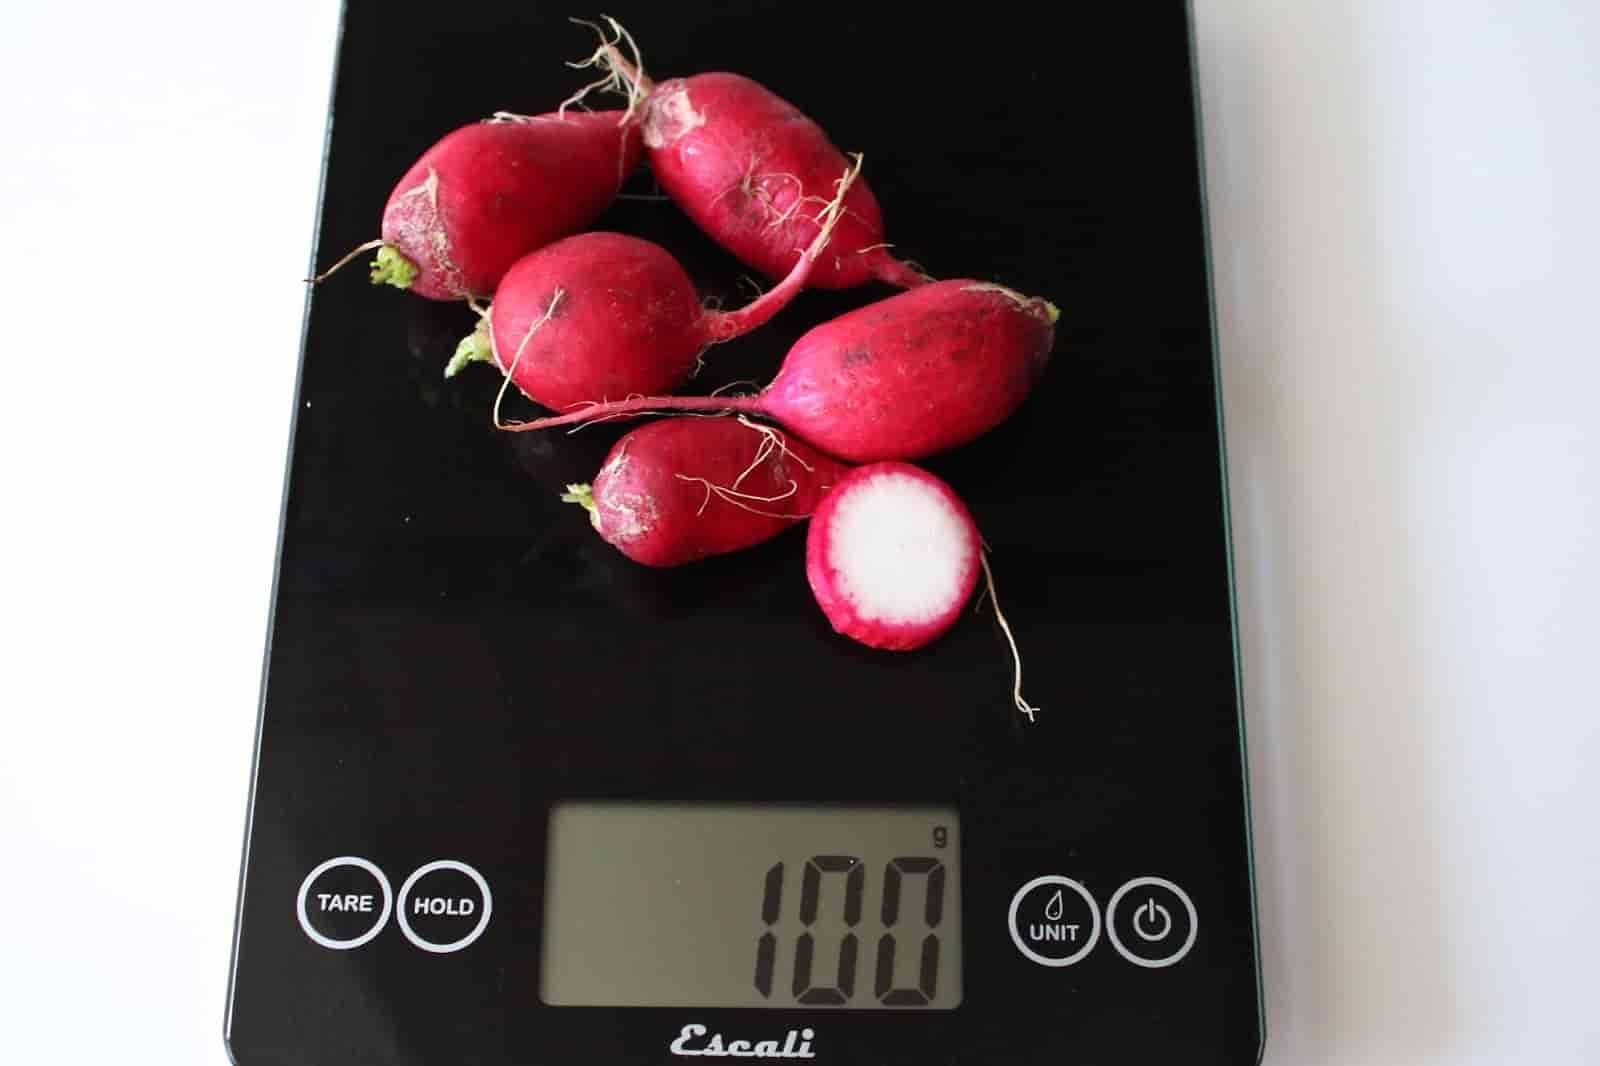 100 грамм редиски (Вес продуктов)